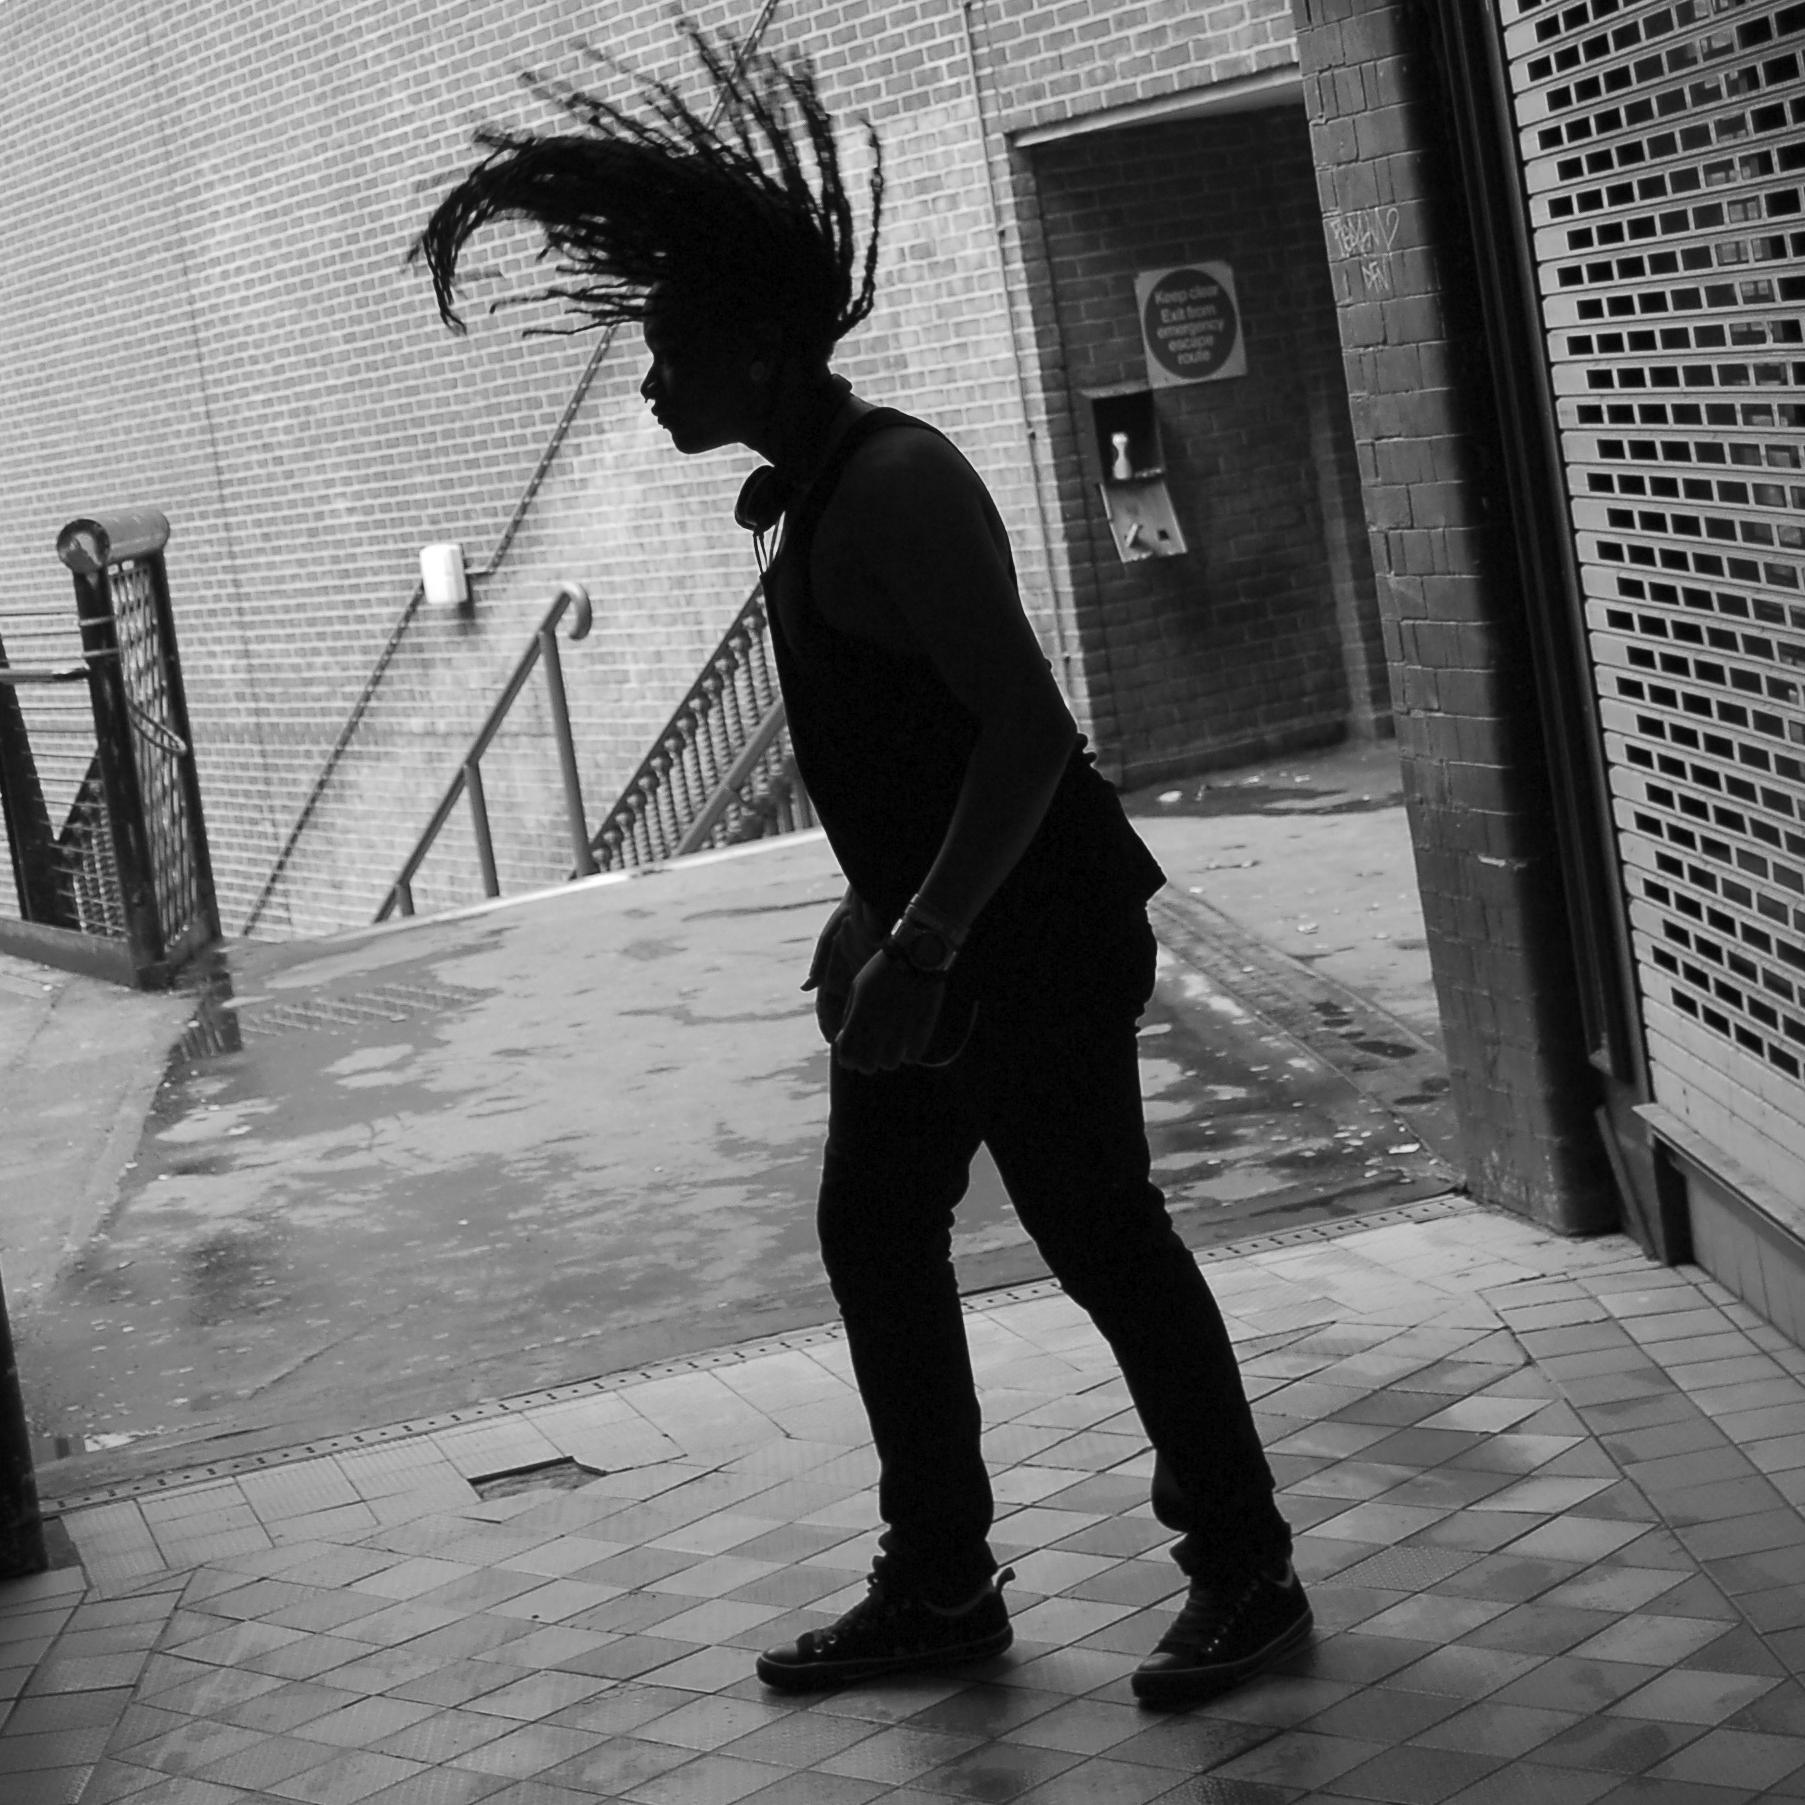 hair swinging